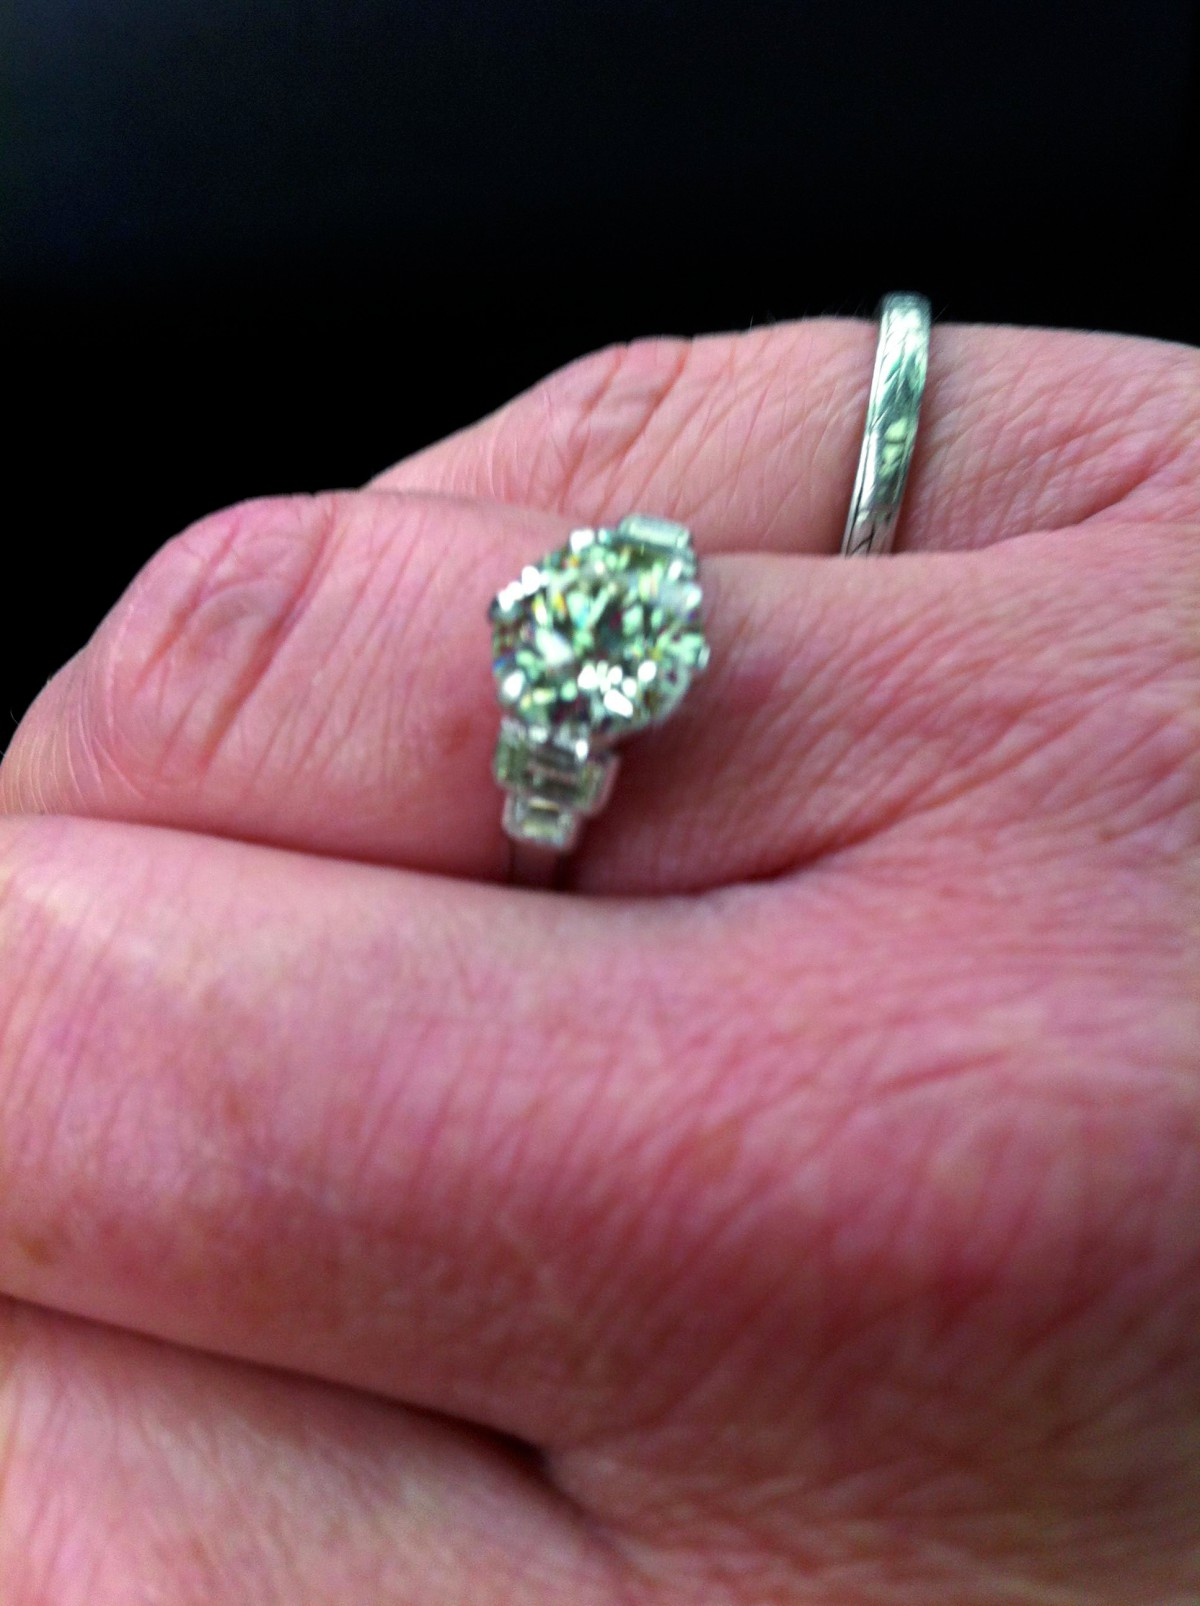 Stolen from Ashtead: Watches, clocks, jewellery, diamond ring ...